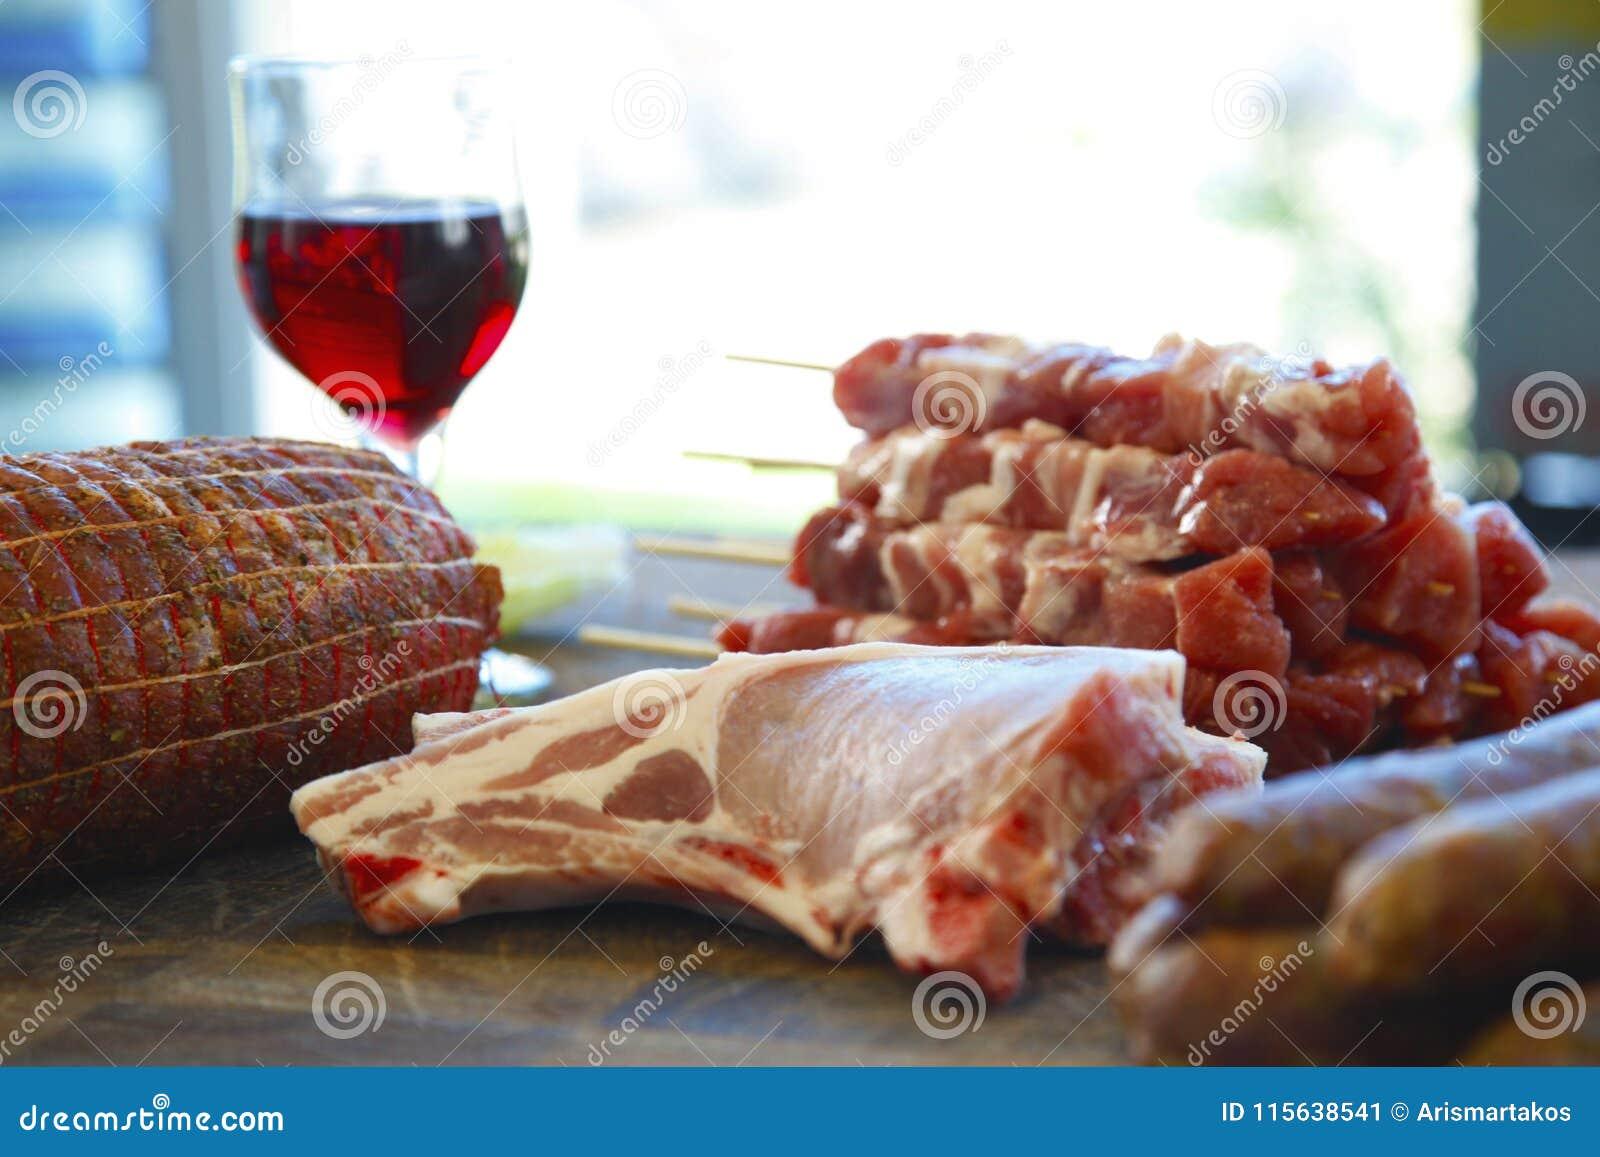 Rå blandade meats